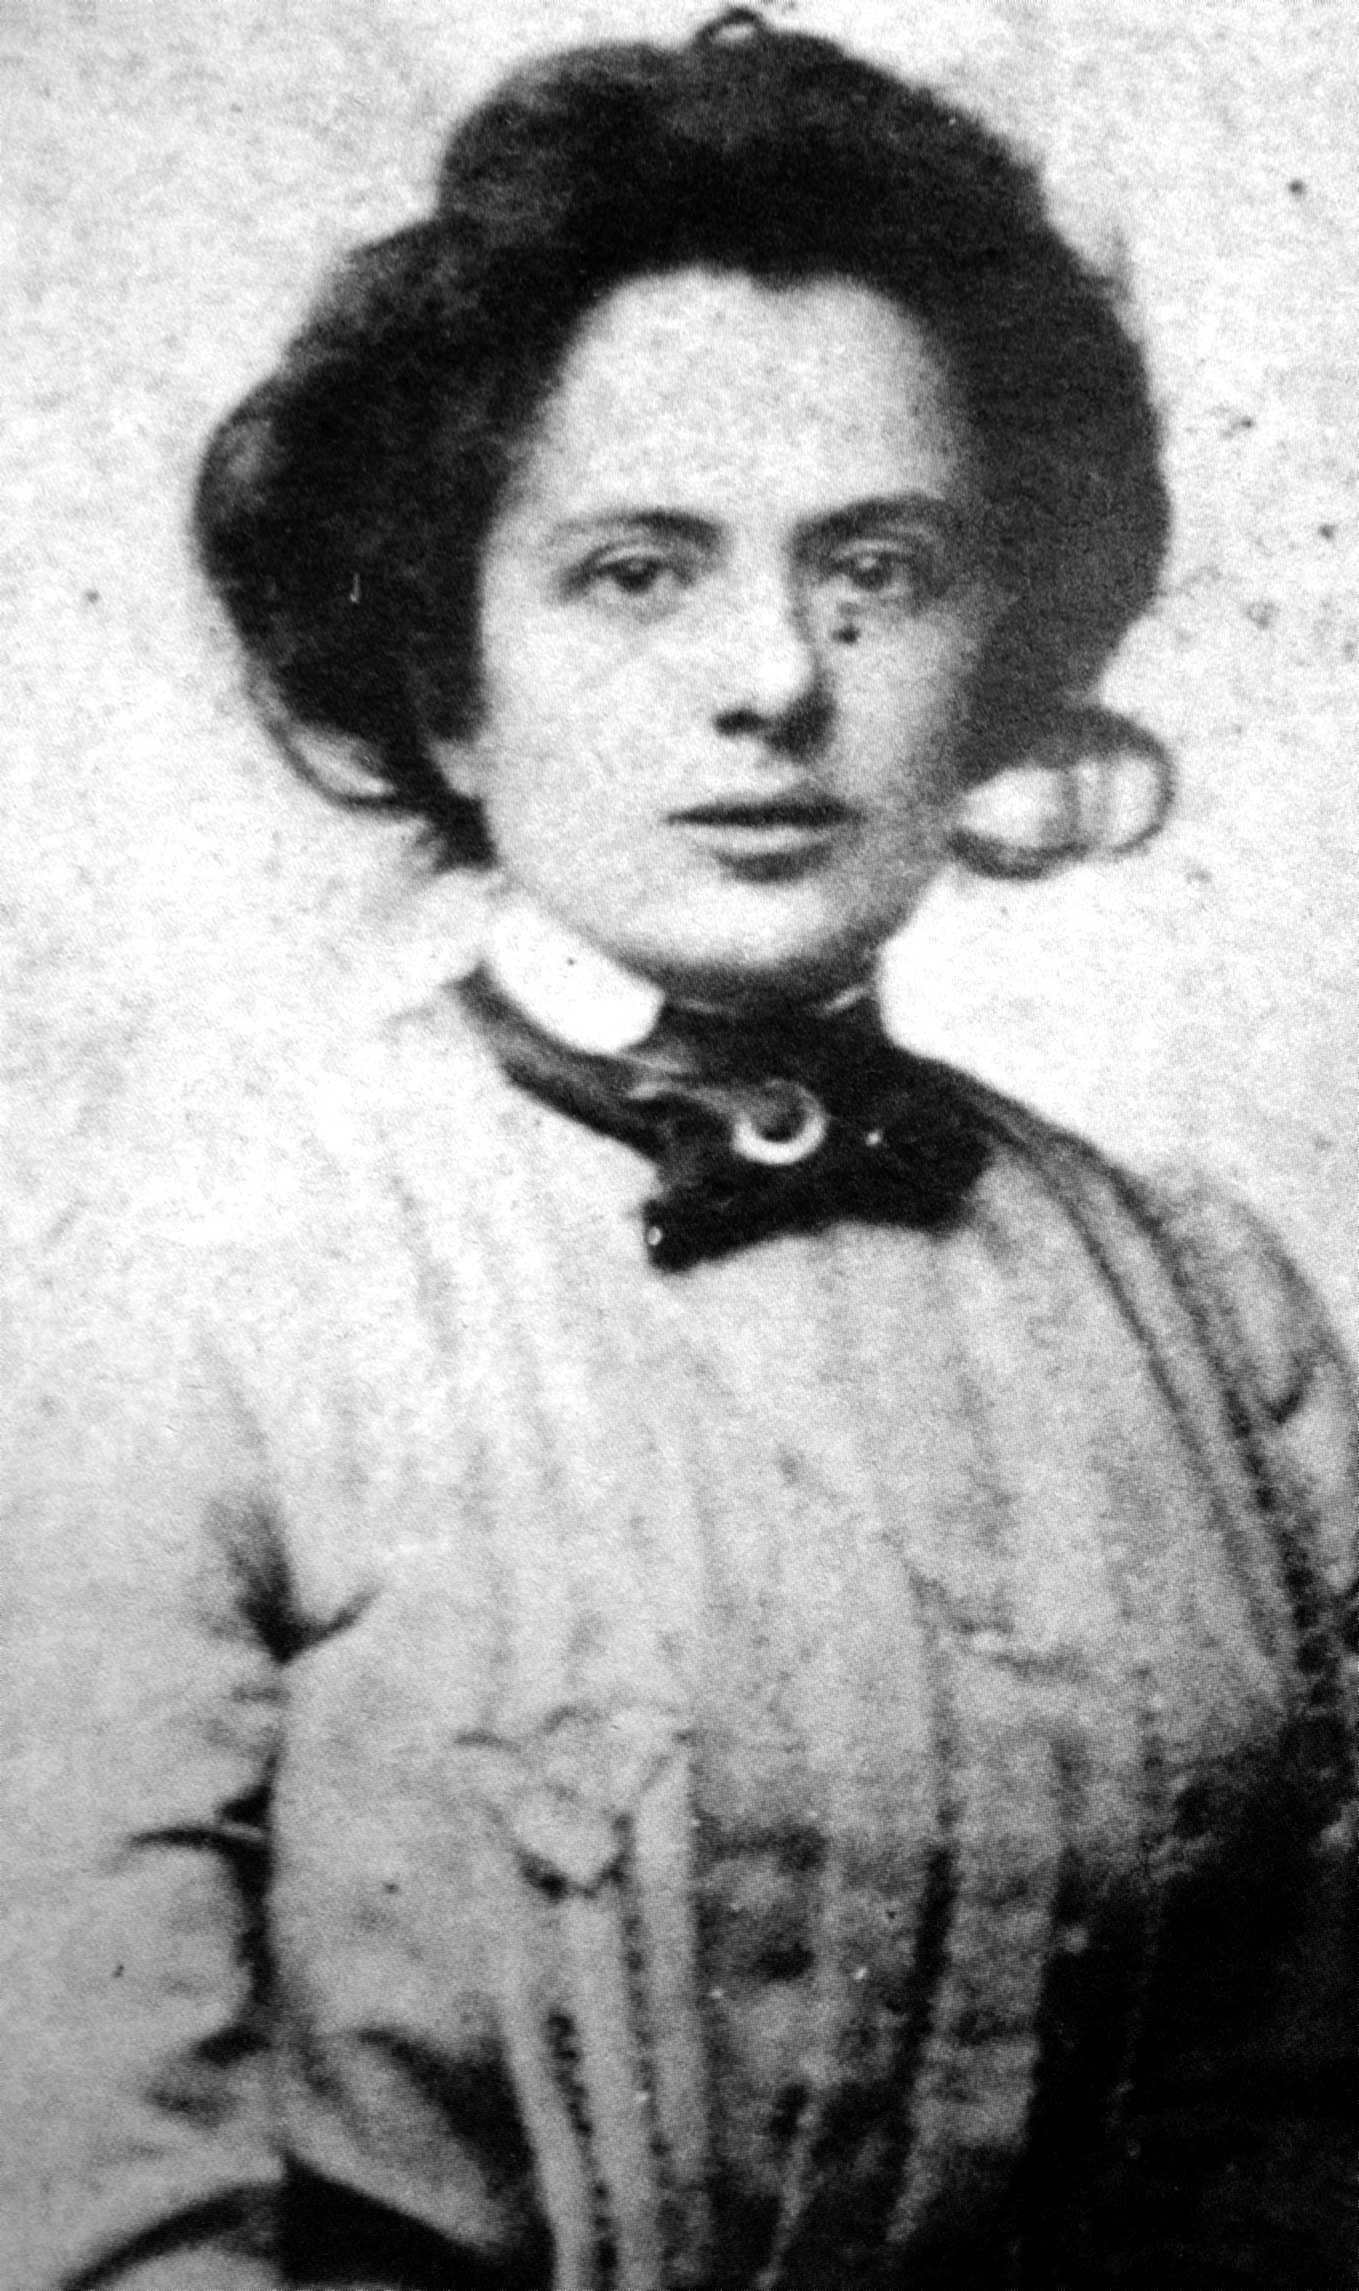 Adalgisa Fochi (ca. 1902)